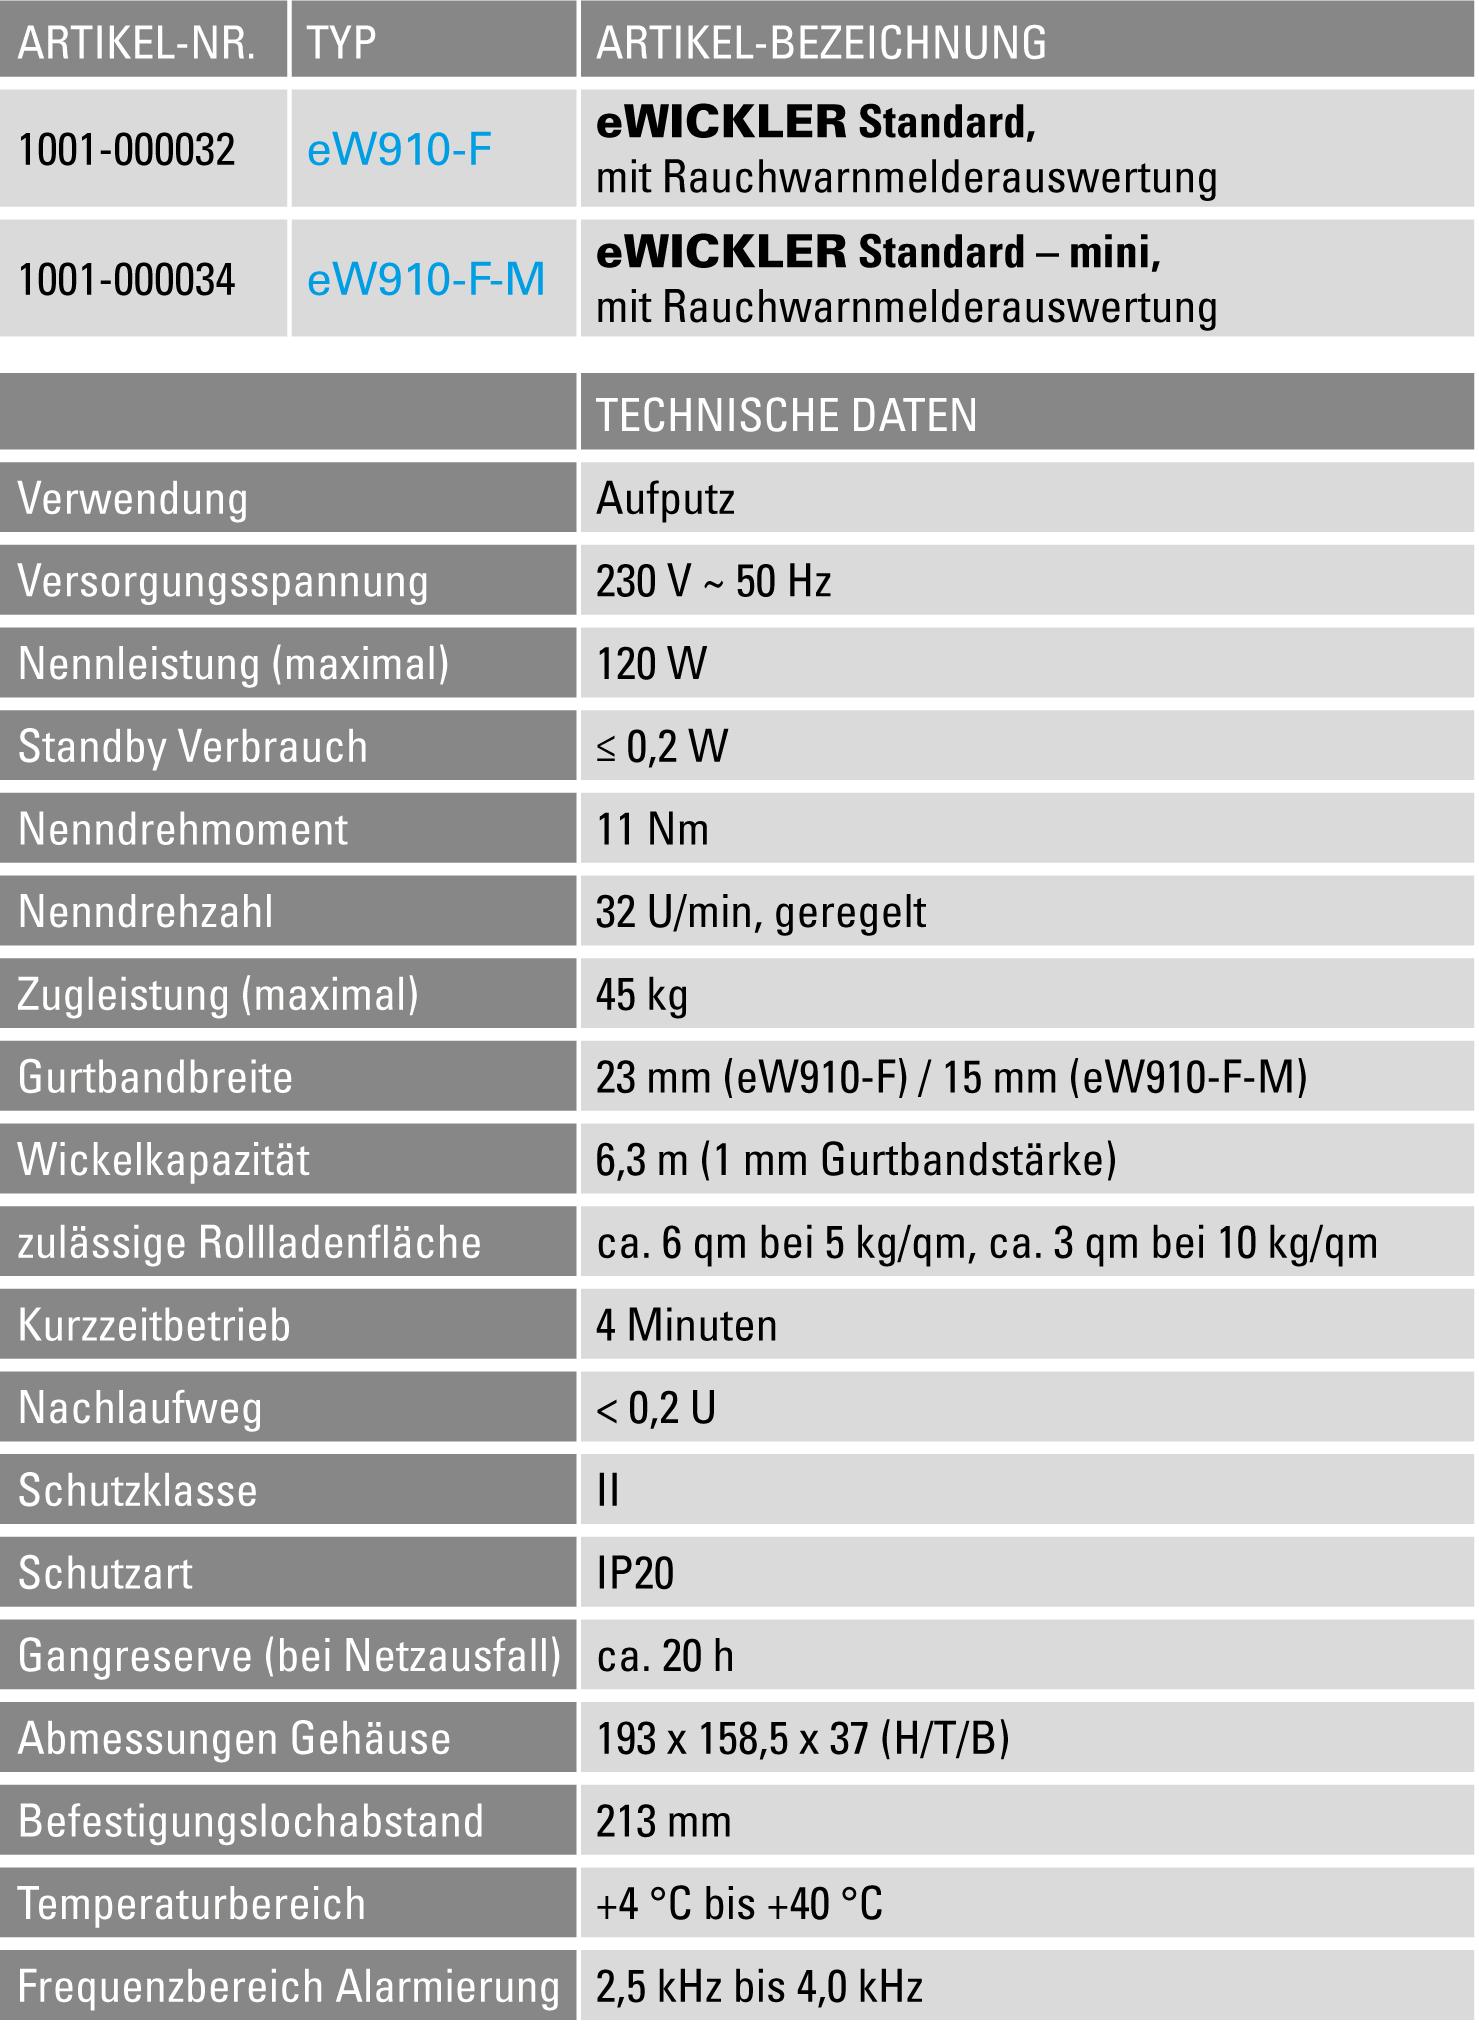 ew910-F-Technische-Daten